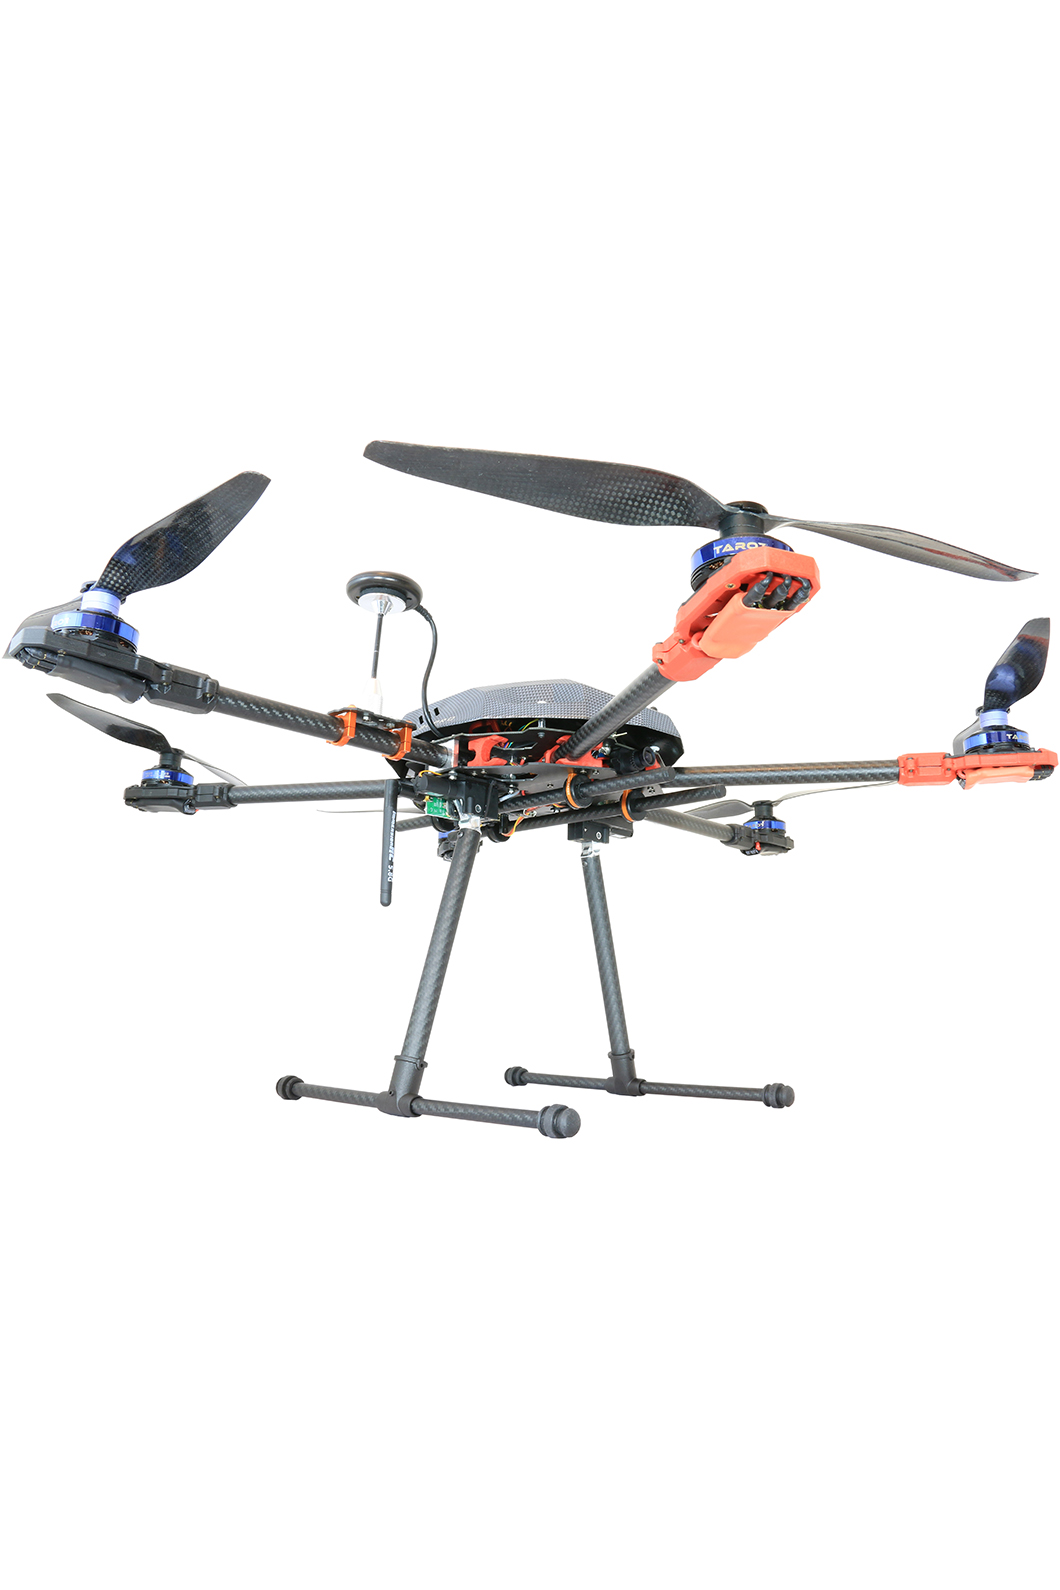 Tarot Carbon Fibre Retractable Landing Gear